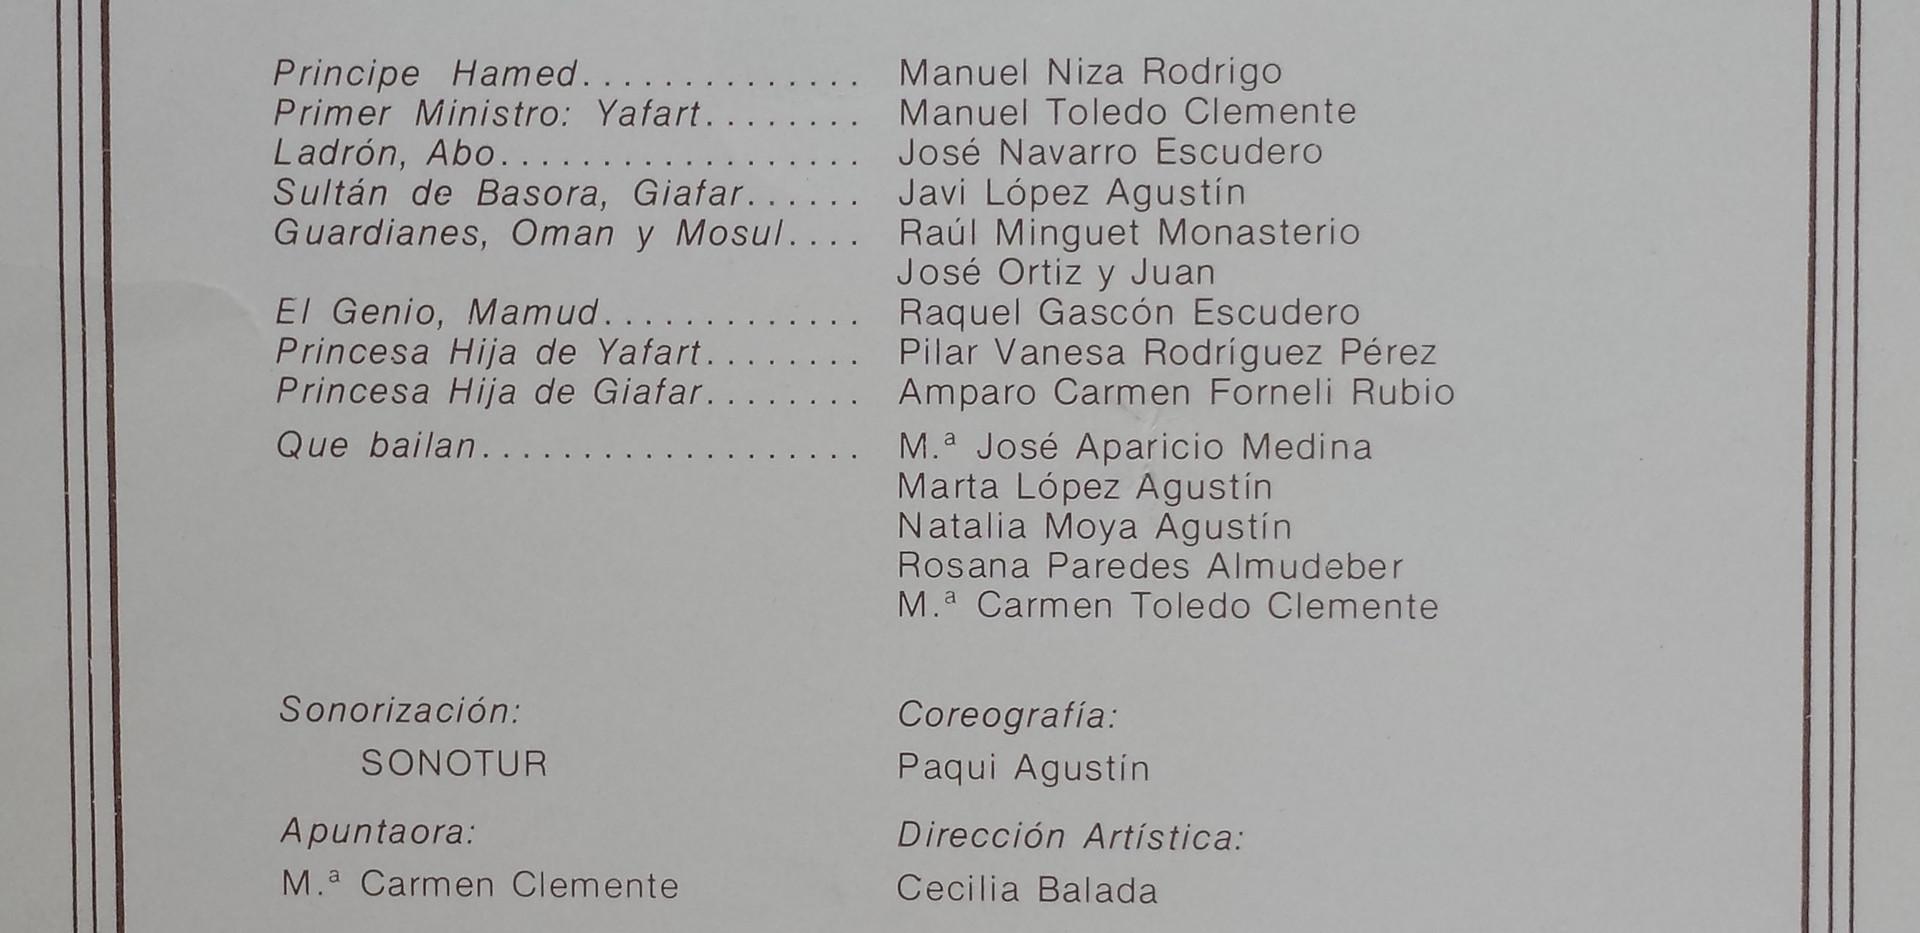 Programa_presentación_infantil_1987.jpg